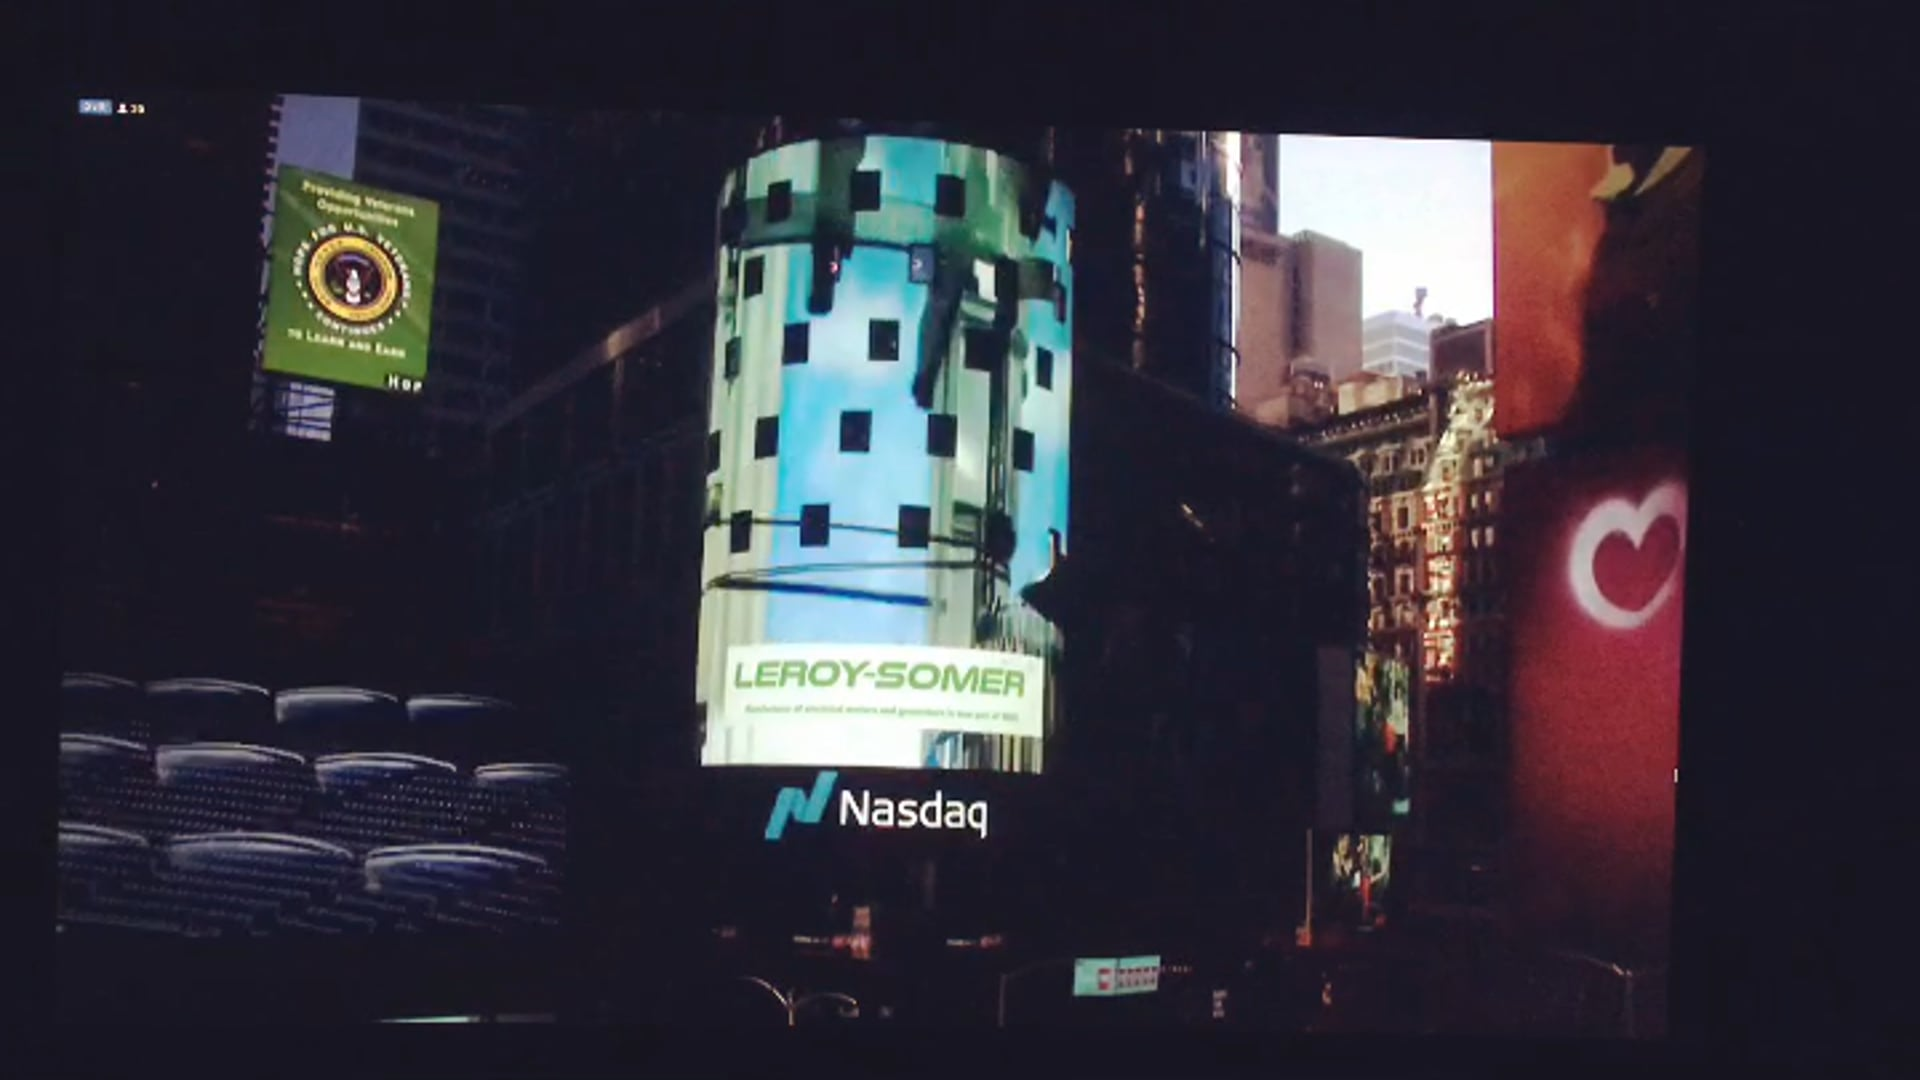 Times Square NYC - Leroy Somer Nidec